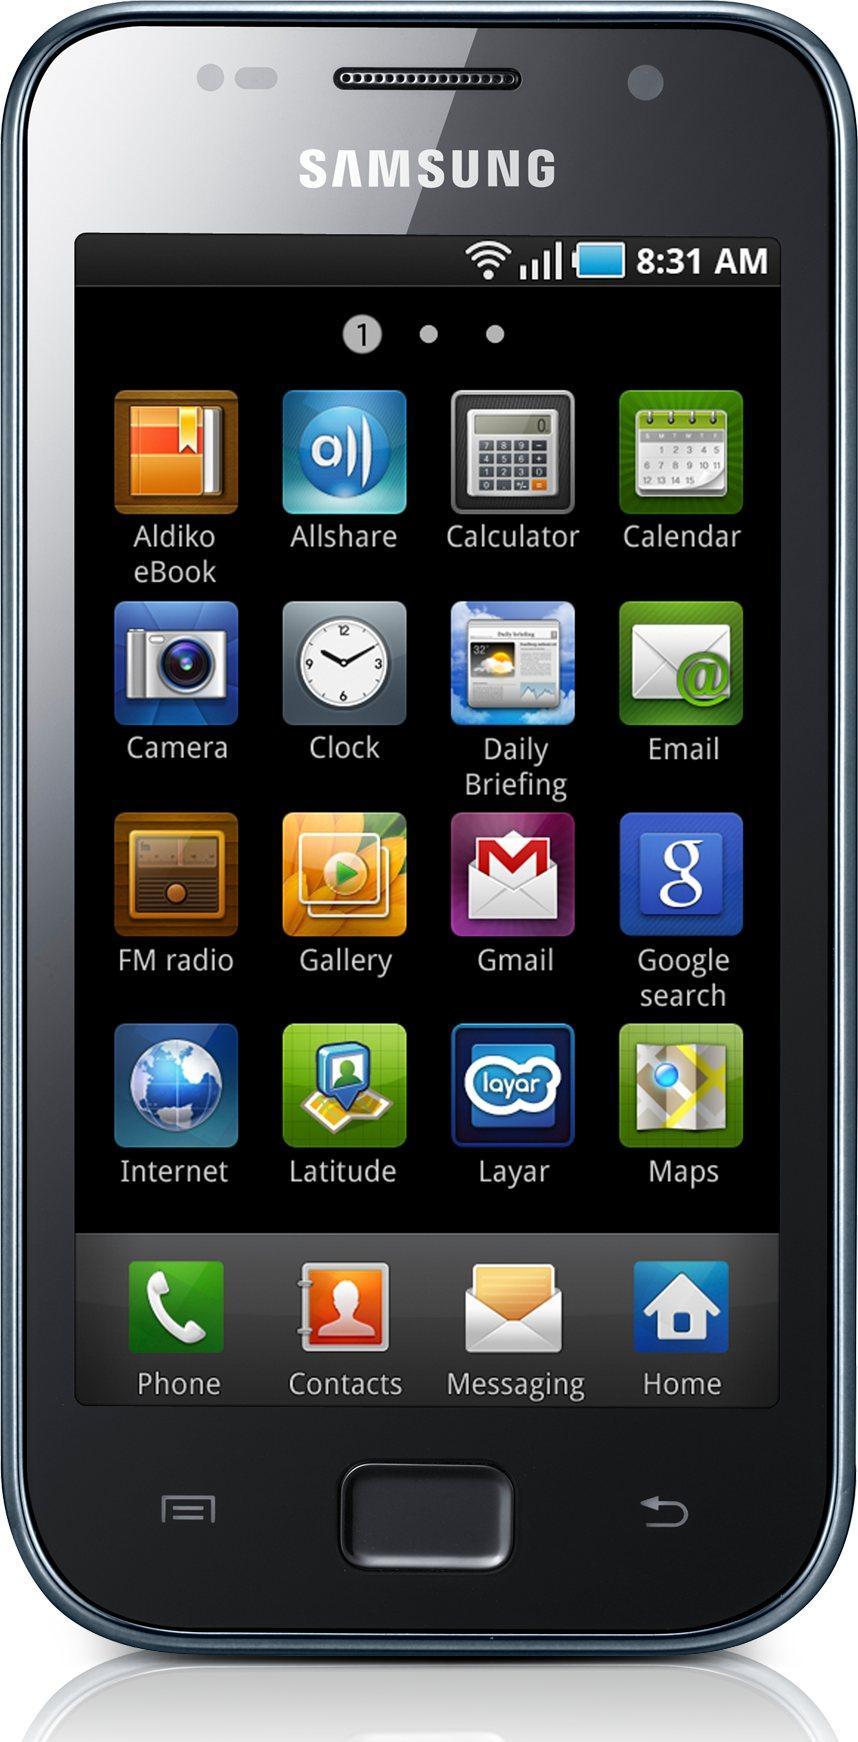 Galaxy S SL GT-I9003